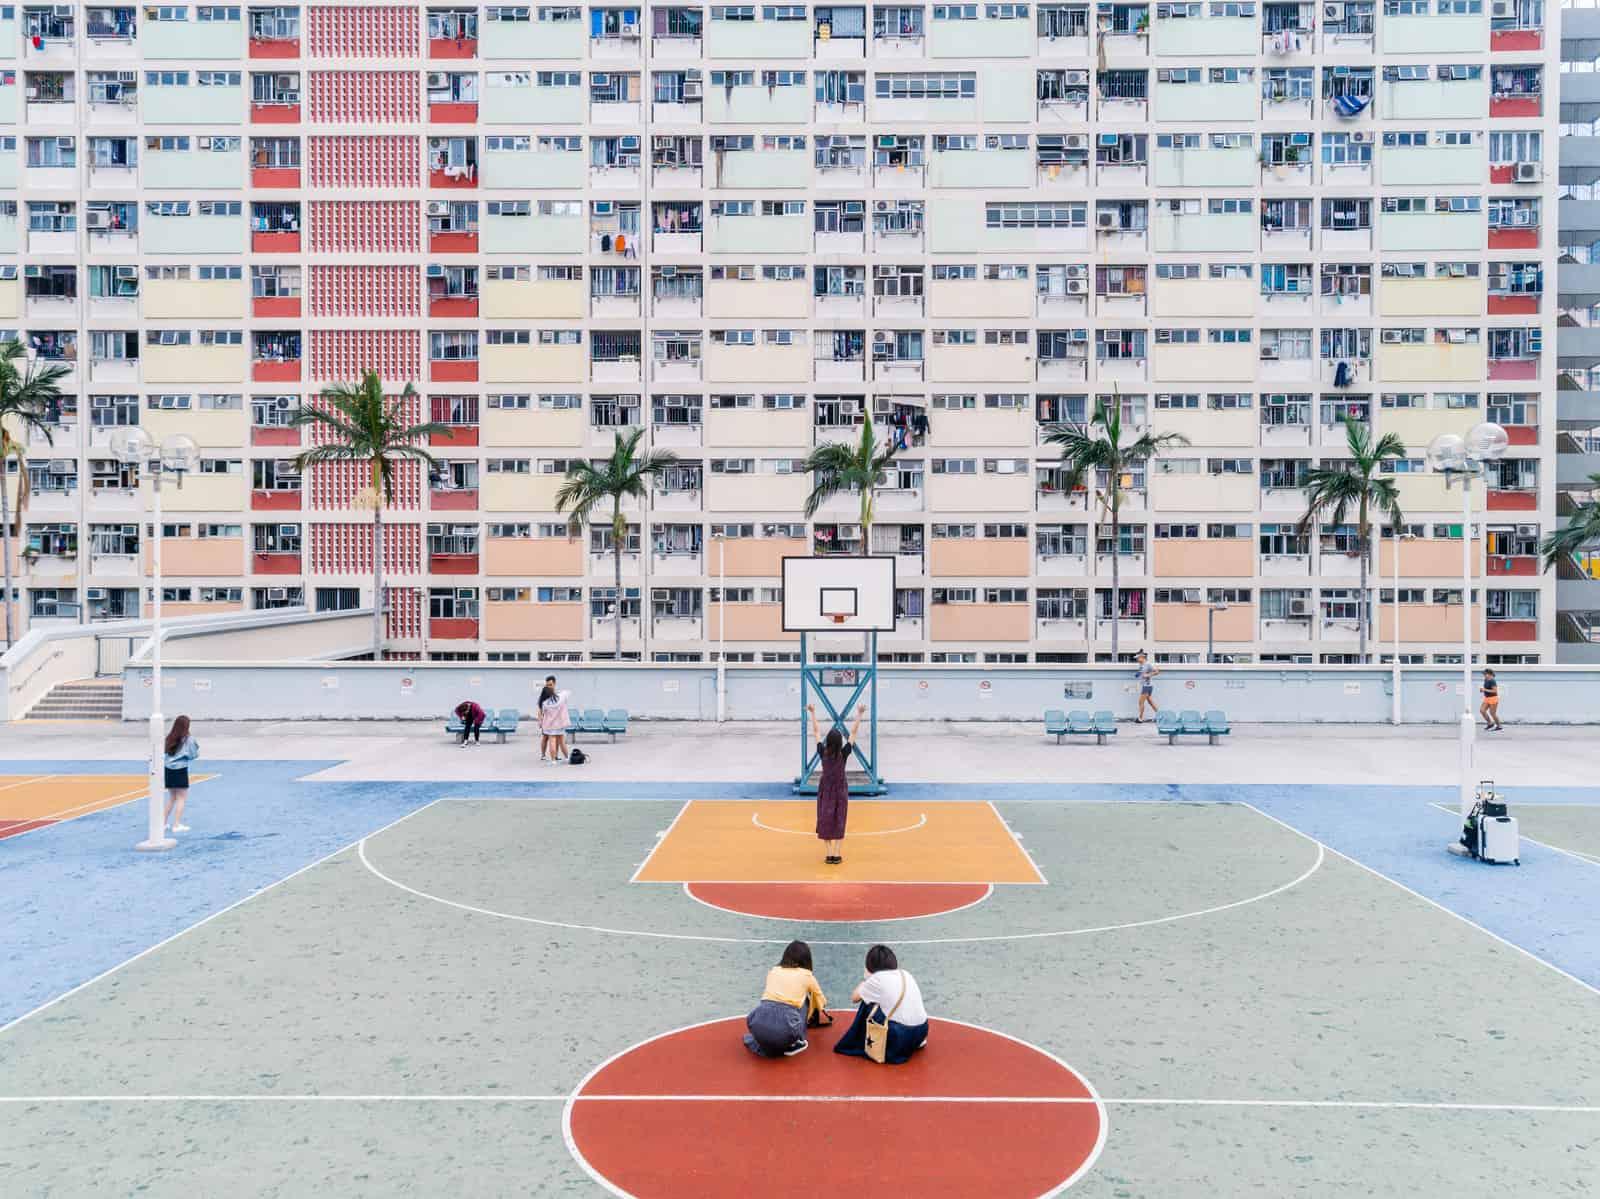 Hong Kong Instagrammable Estate